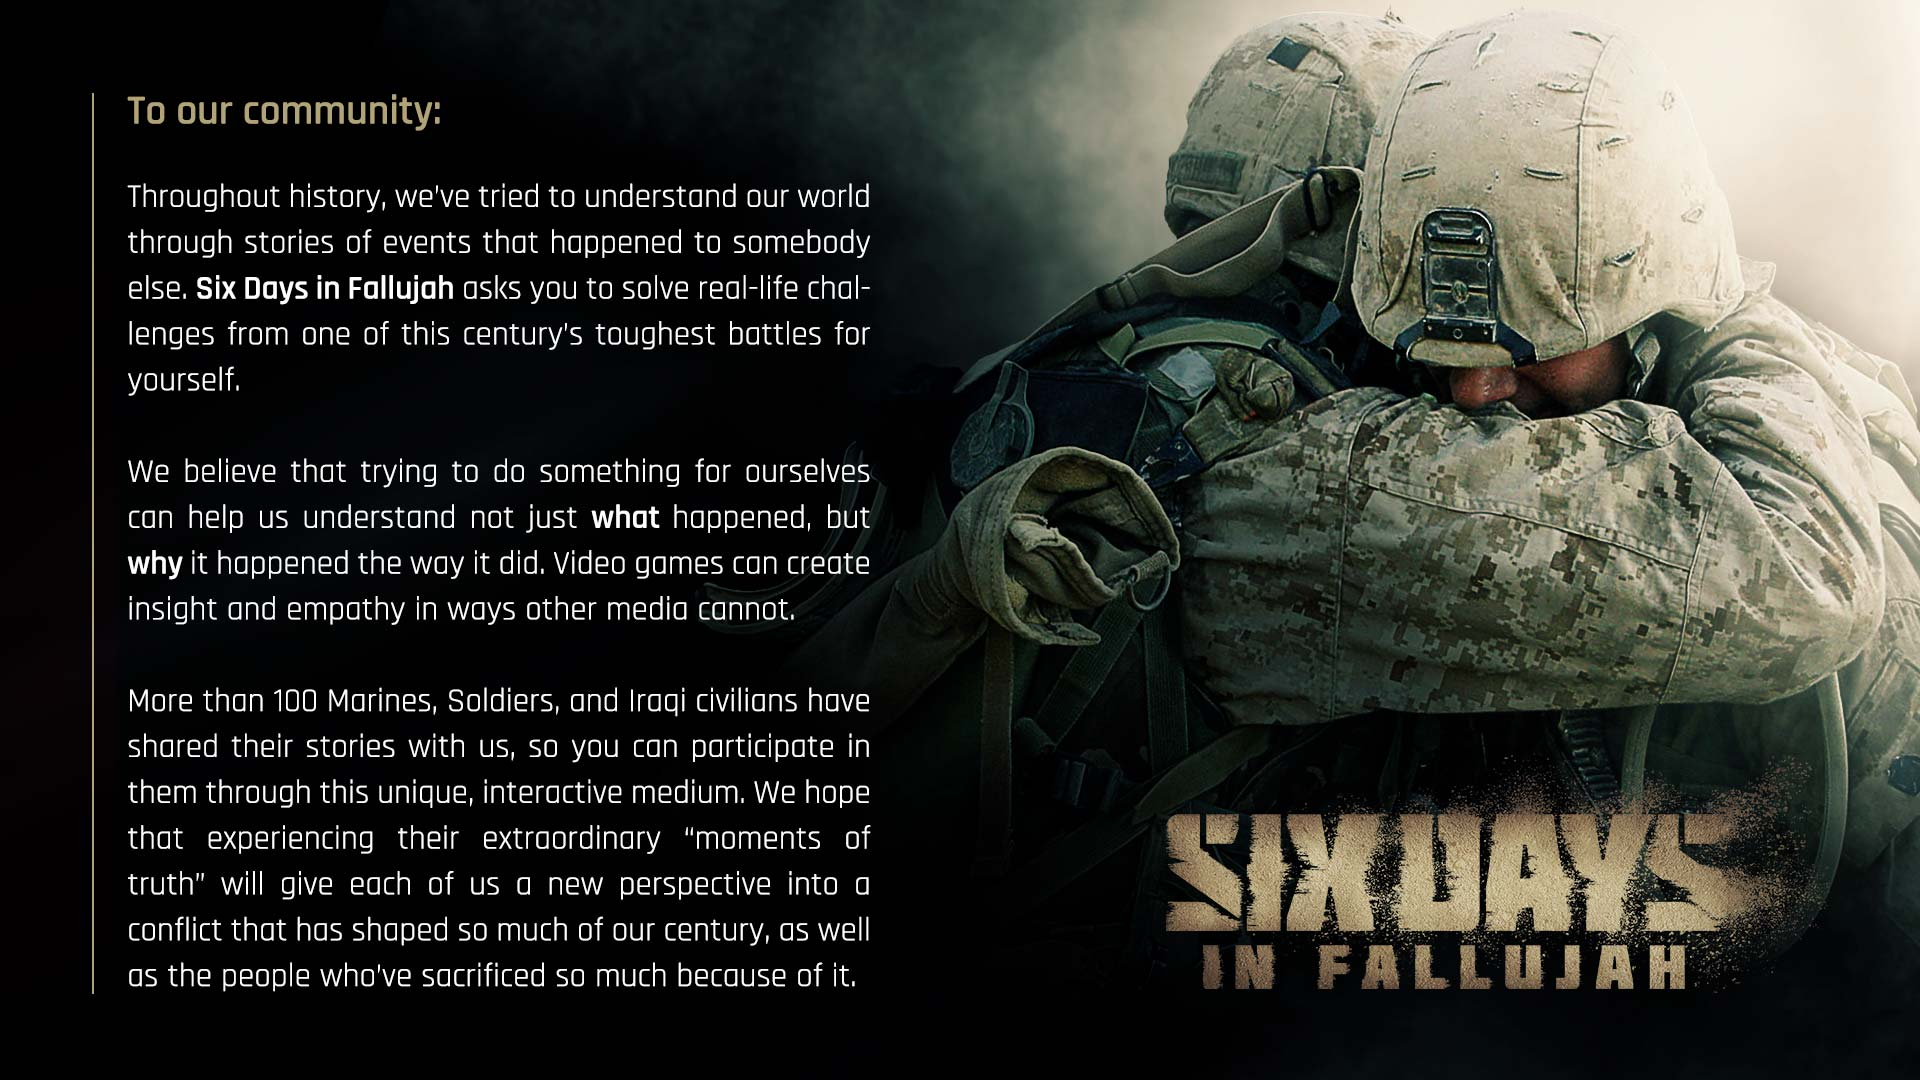 Six Days of Fallujah - Community post - 11/02/21